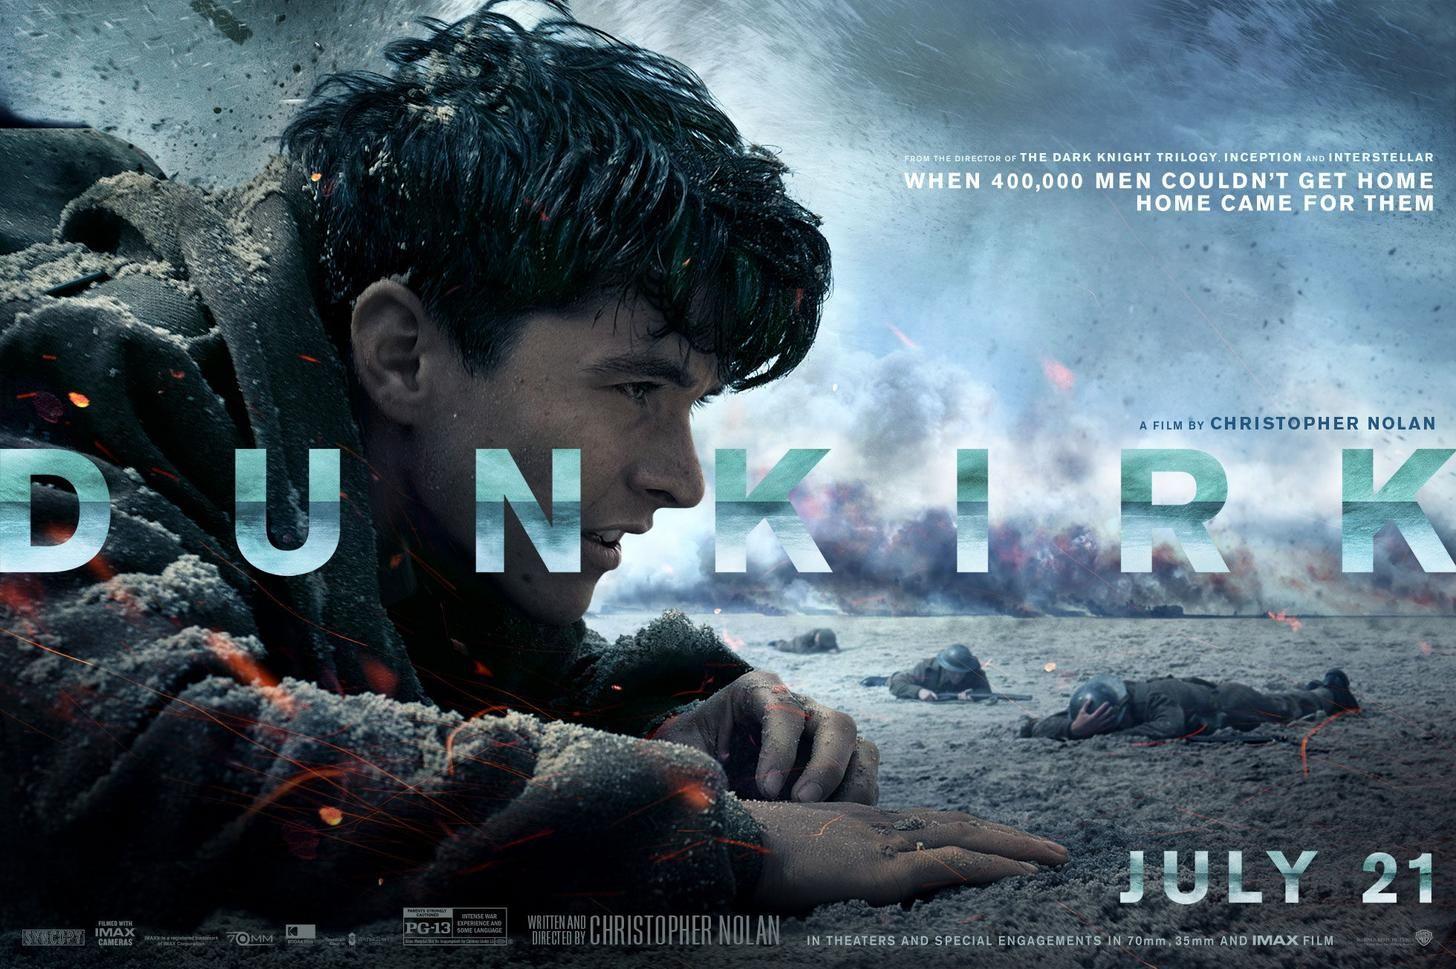 Dunkirk 2017 Movie Details Release Date Star Cast Budget Trailer Box Office Dunkirk Dunkirk Movie Christopher Nolan